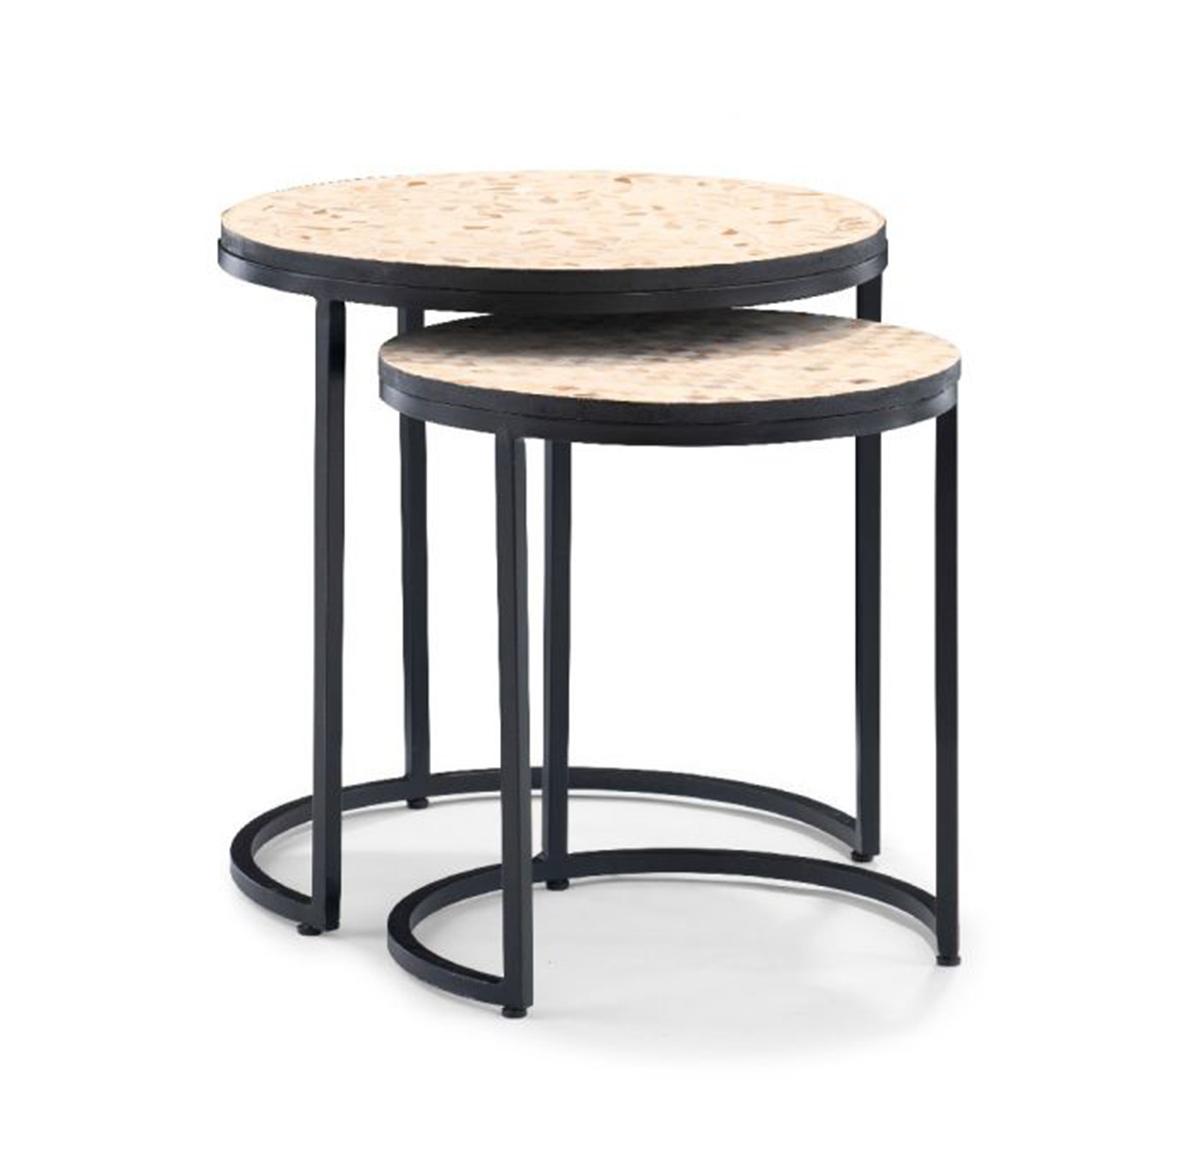 Powell Dutson Nesting Tables - Black/Natural wood mosaic